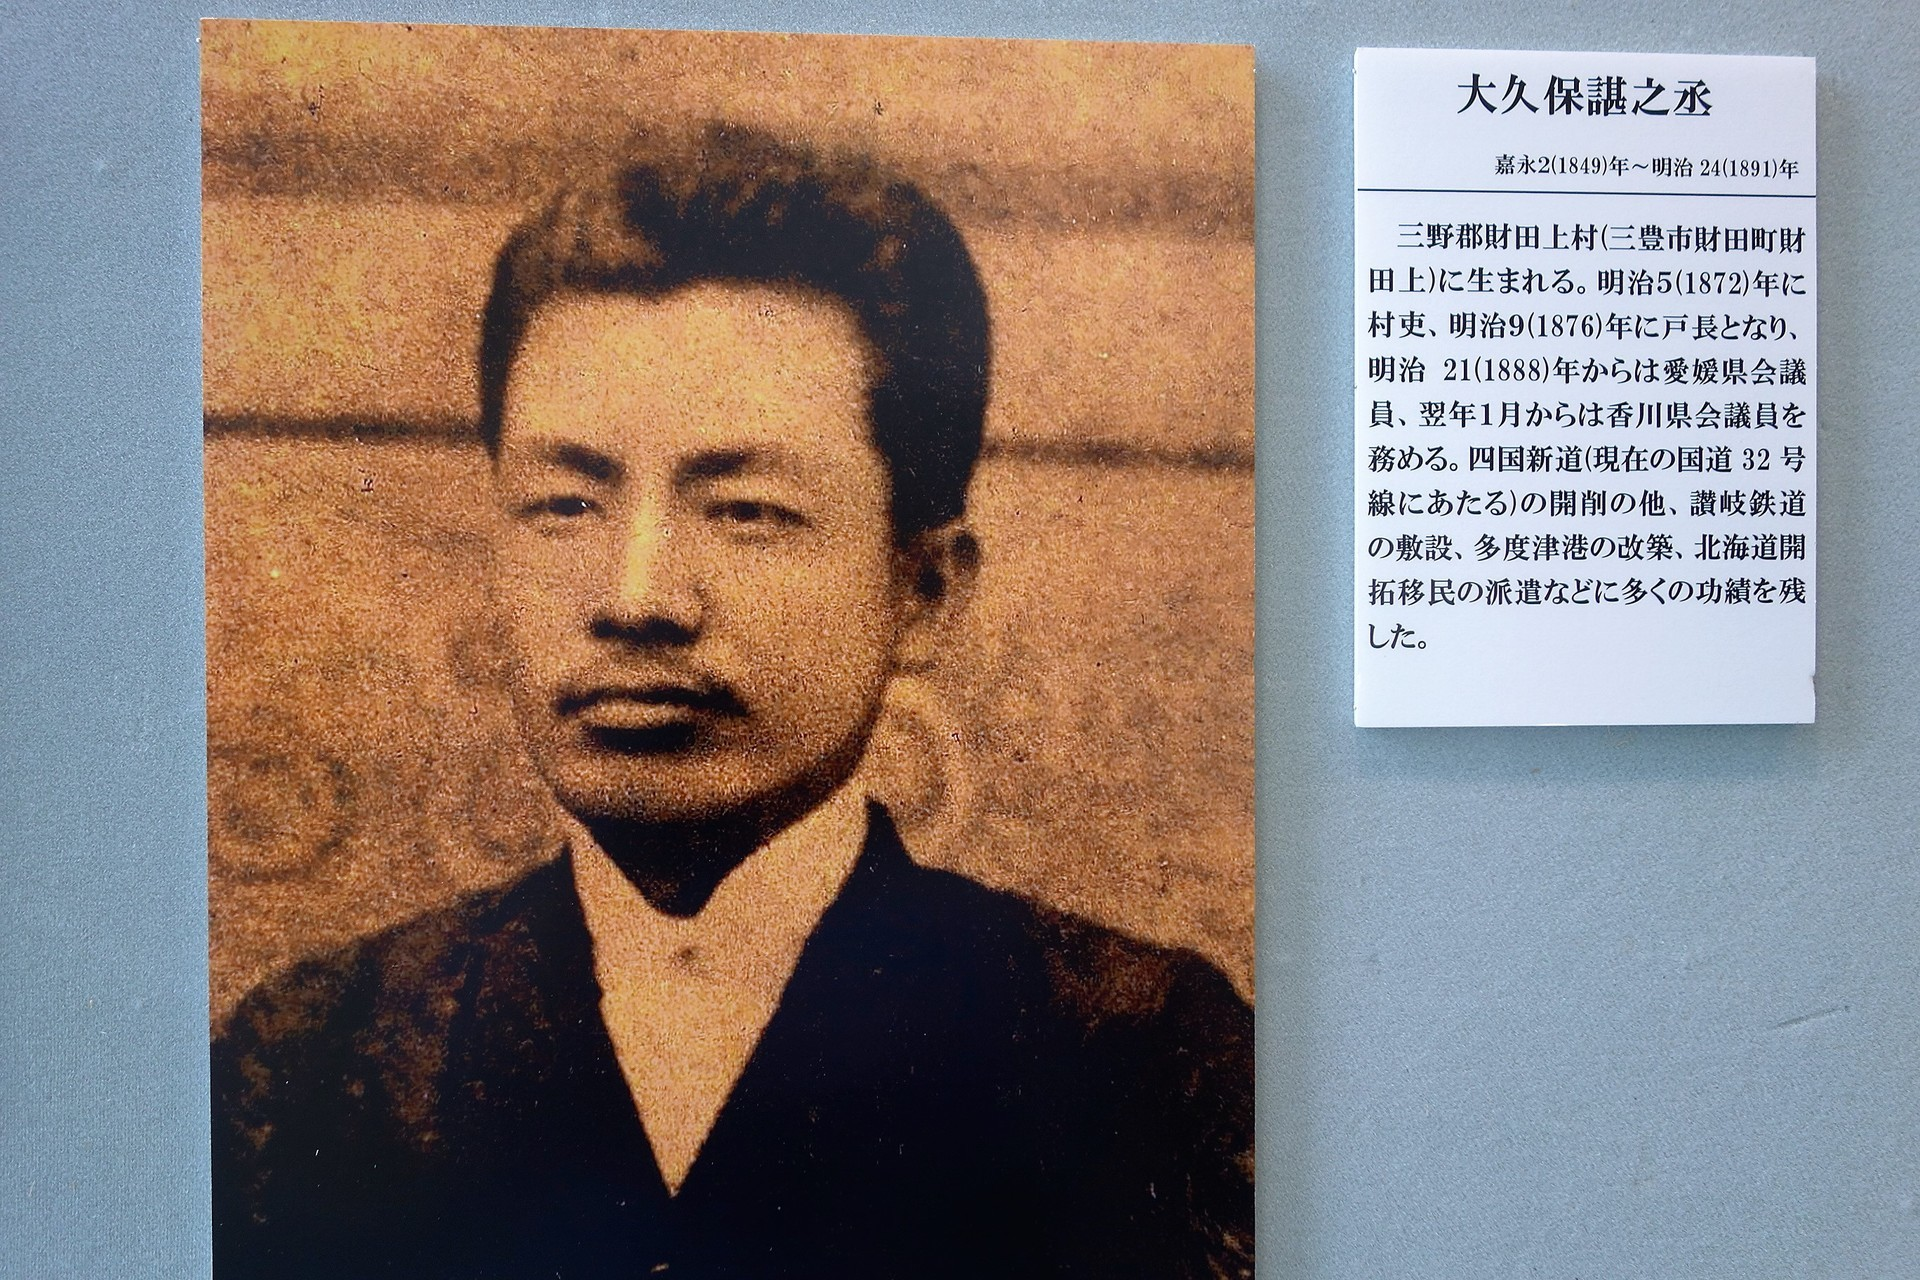 香川用水記念公園:水口祭(6/11)と大久保諶之丞特別展(~6/12)の ...